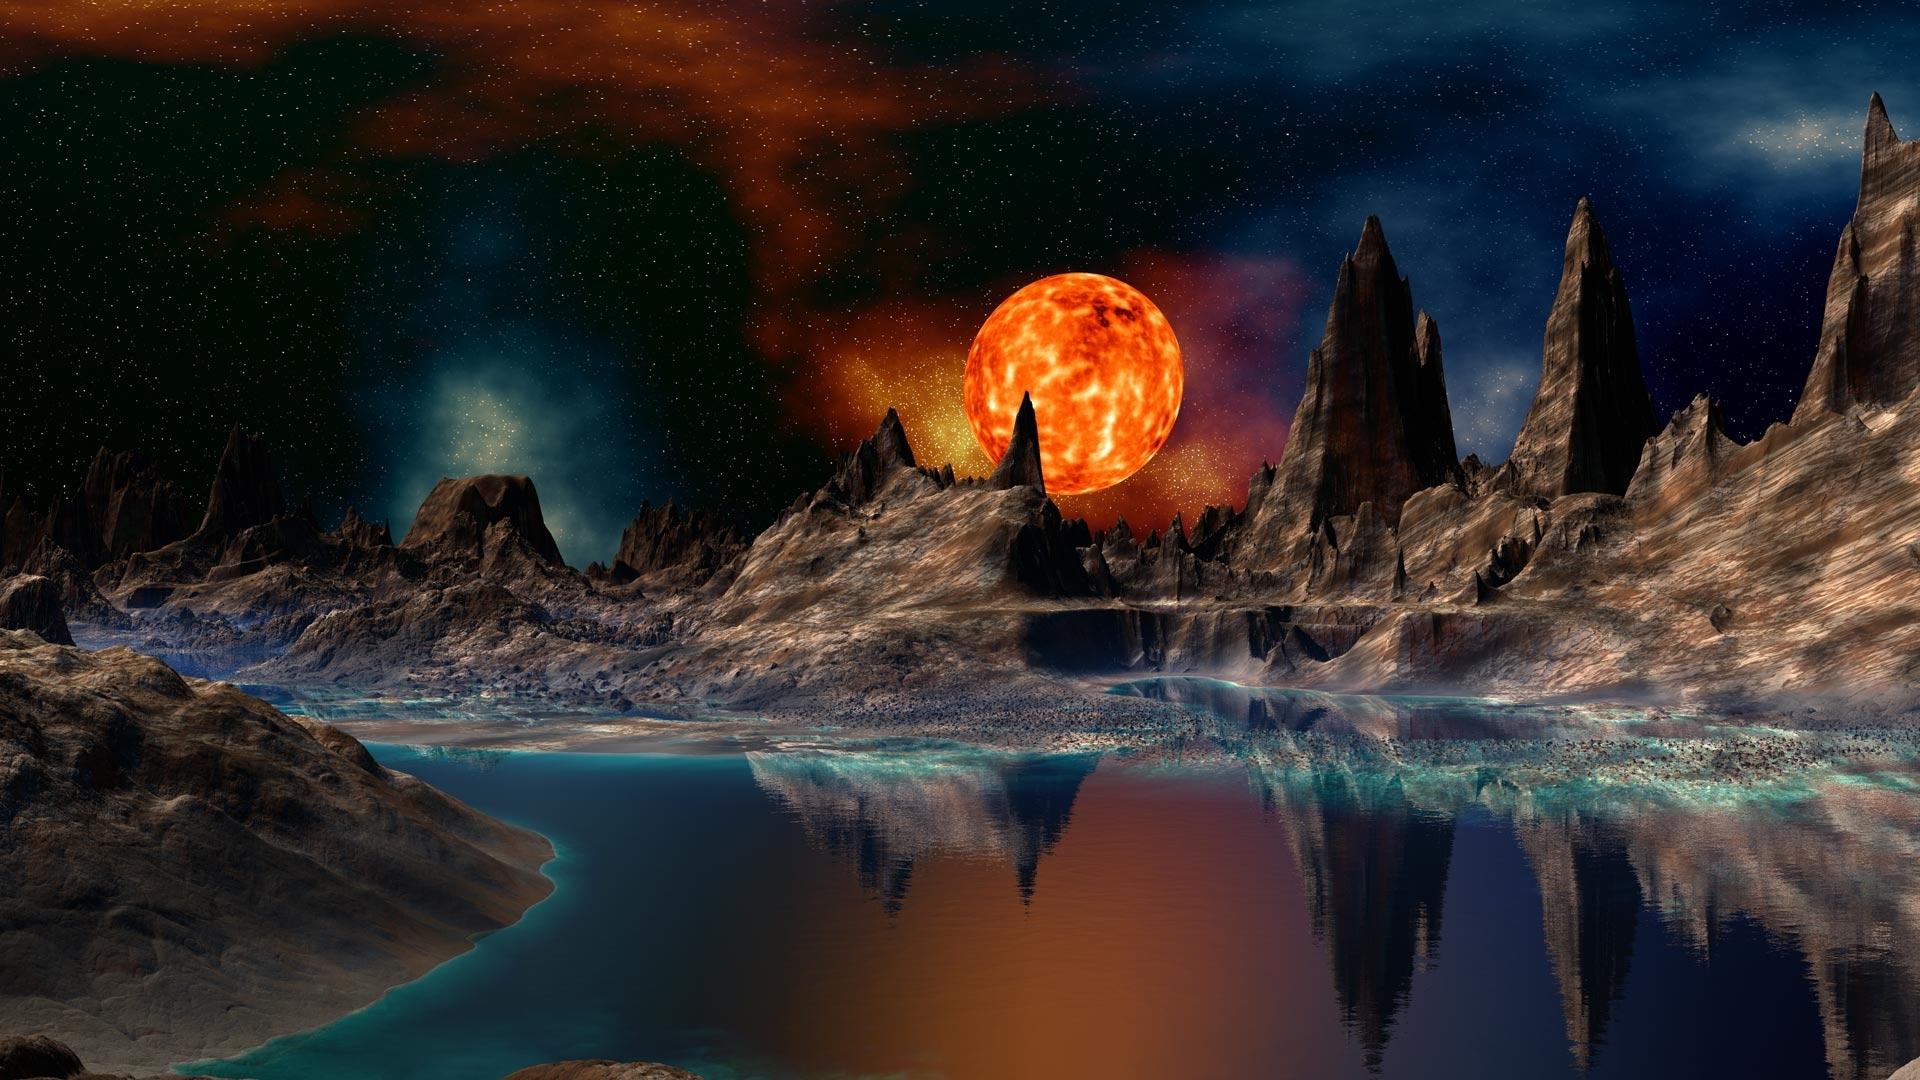 free desktop sci fi wallpapers - page 3 of 3 - wallpaper.wiki